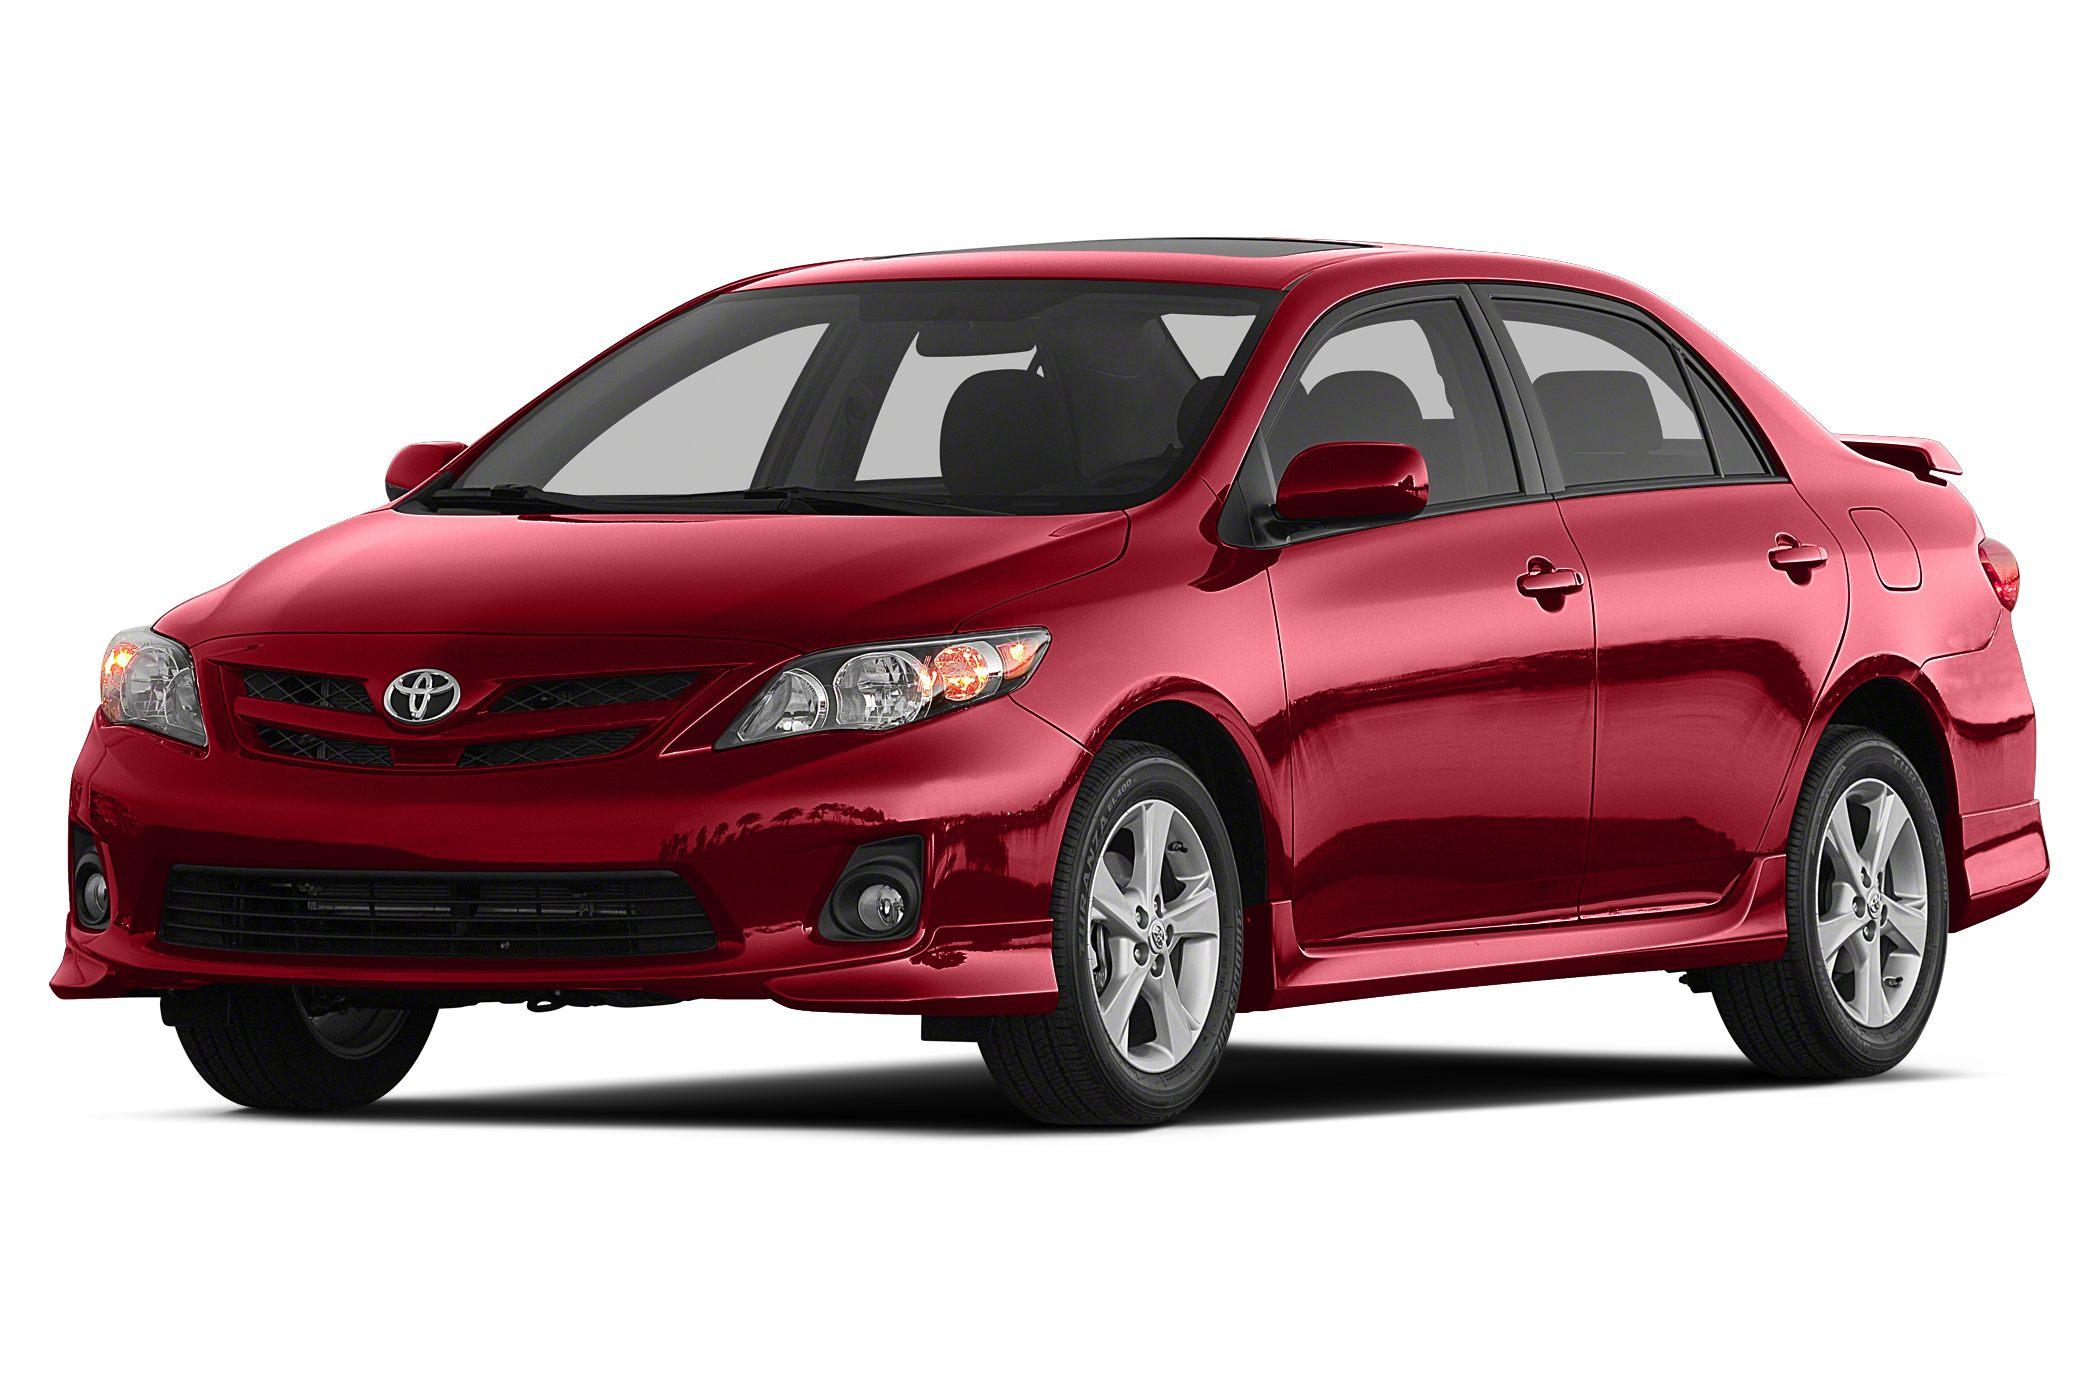 2012 Toyota Corolla S 4dr Sedan Specs And Prices